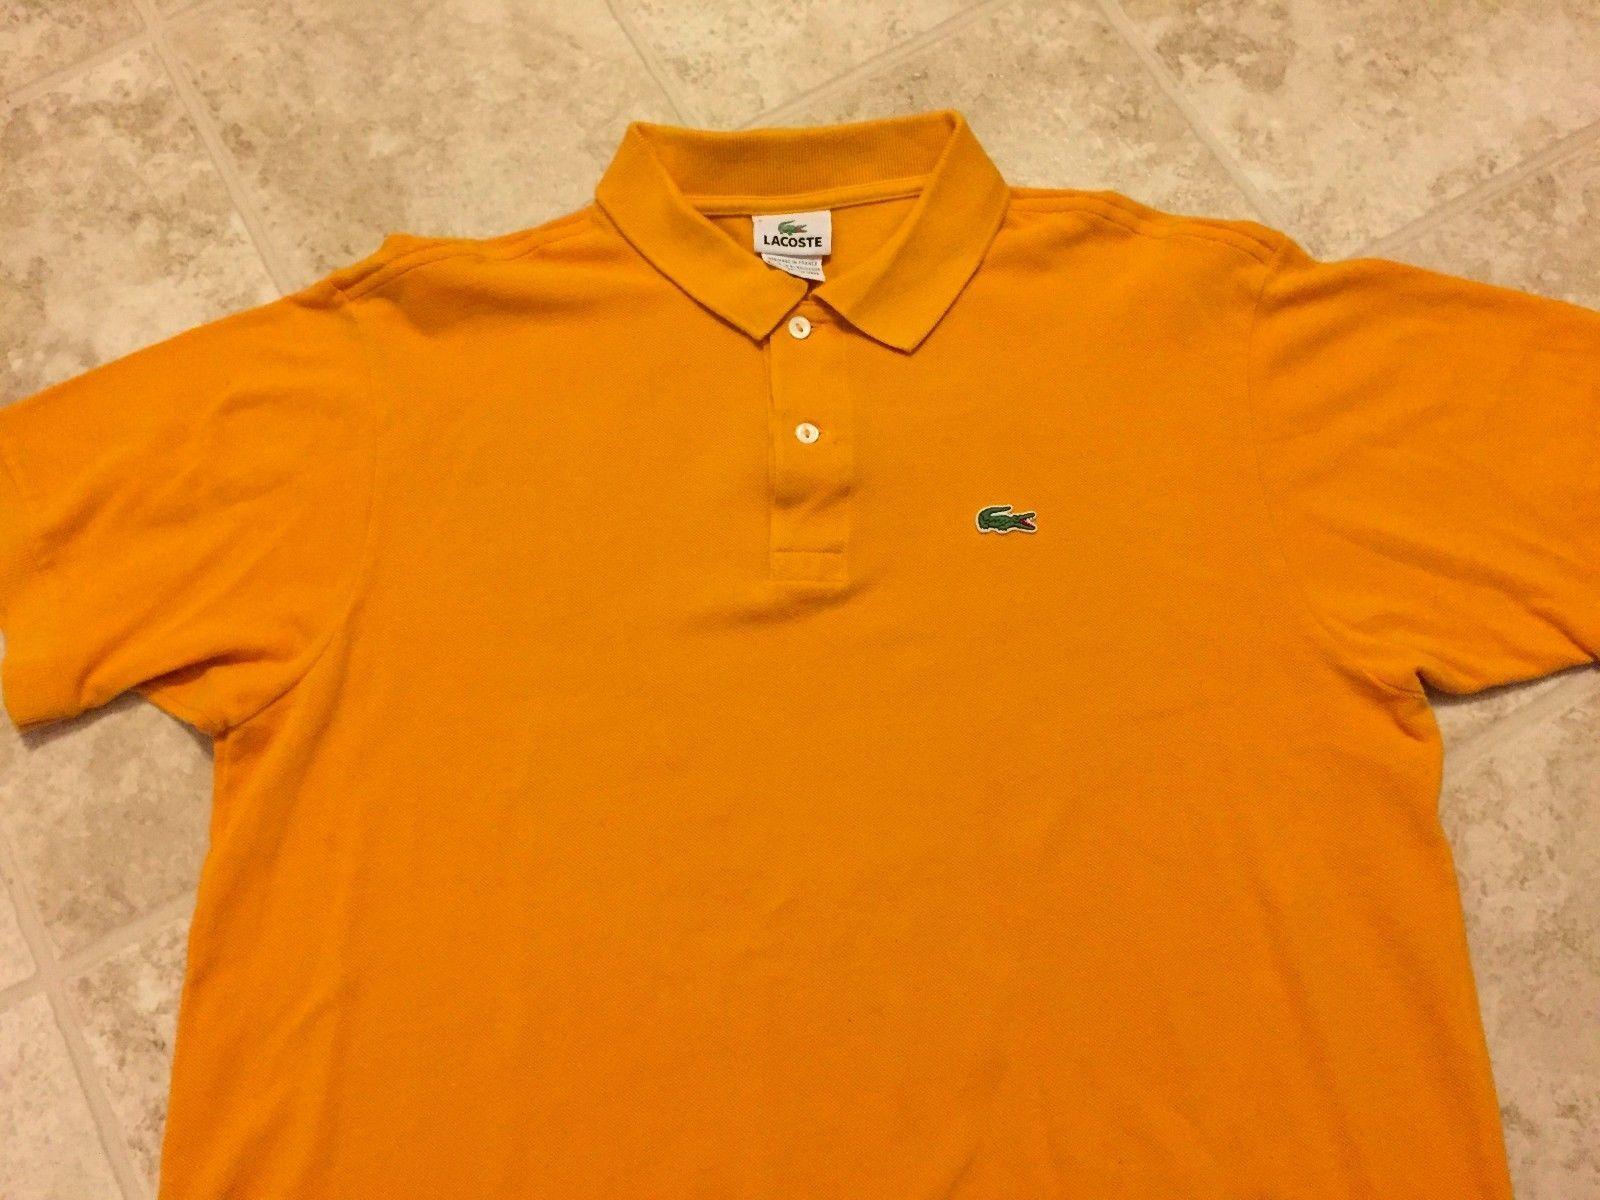 c7e1bcd0 Mens Orange Lacoste Polo Shirt - DREAMWORKS